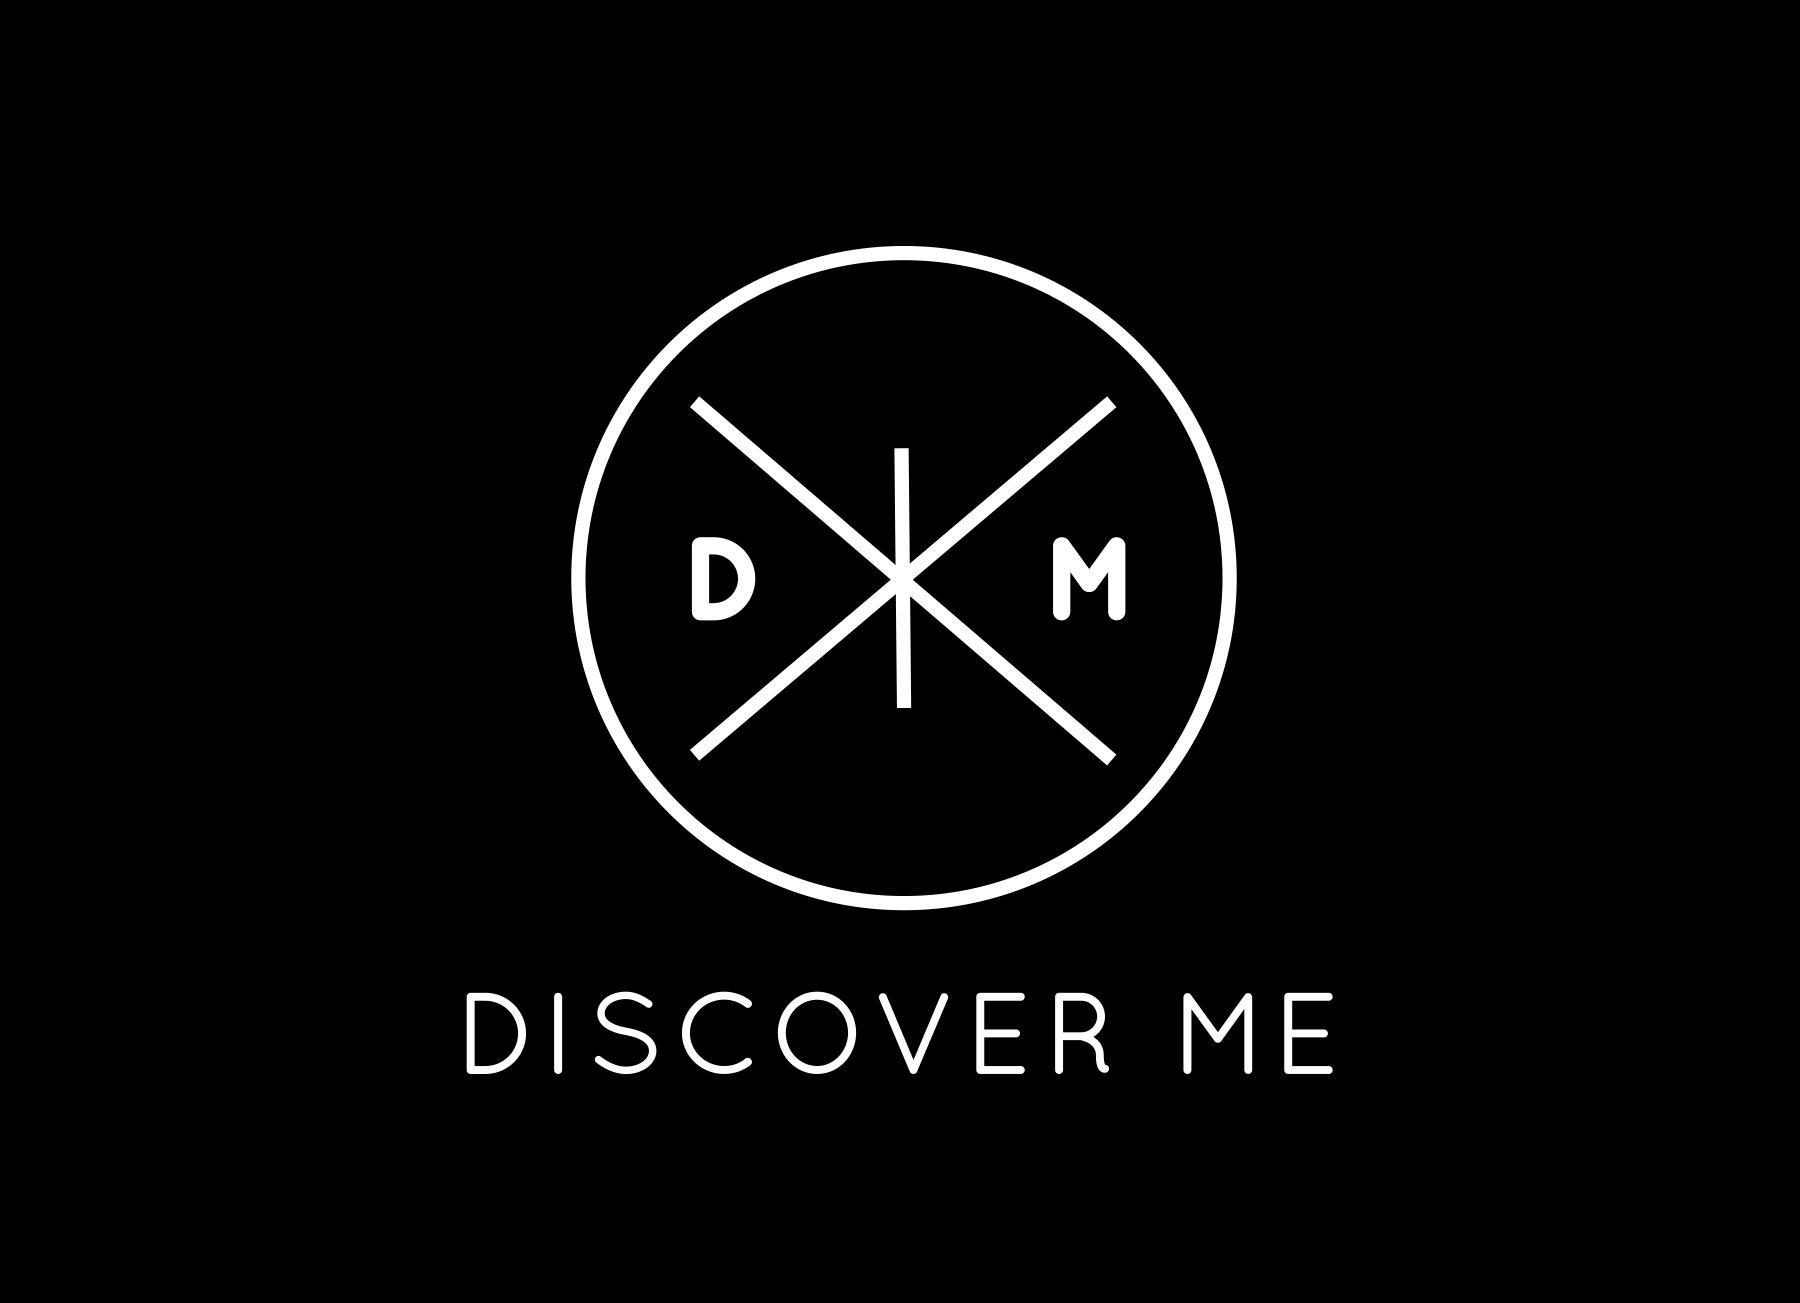 Logo-Discover-Me-identite-visuelle-julia-capdebos-1.jpg